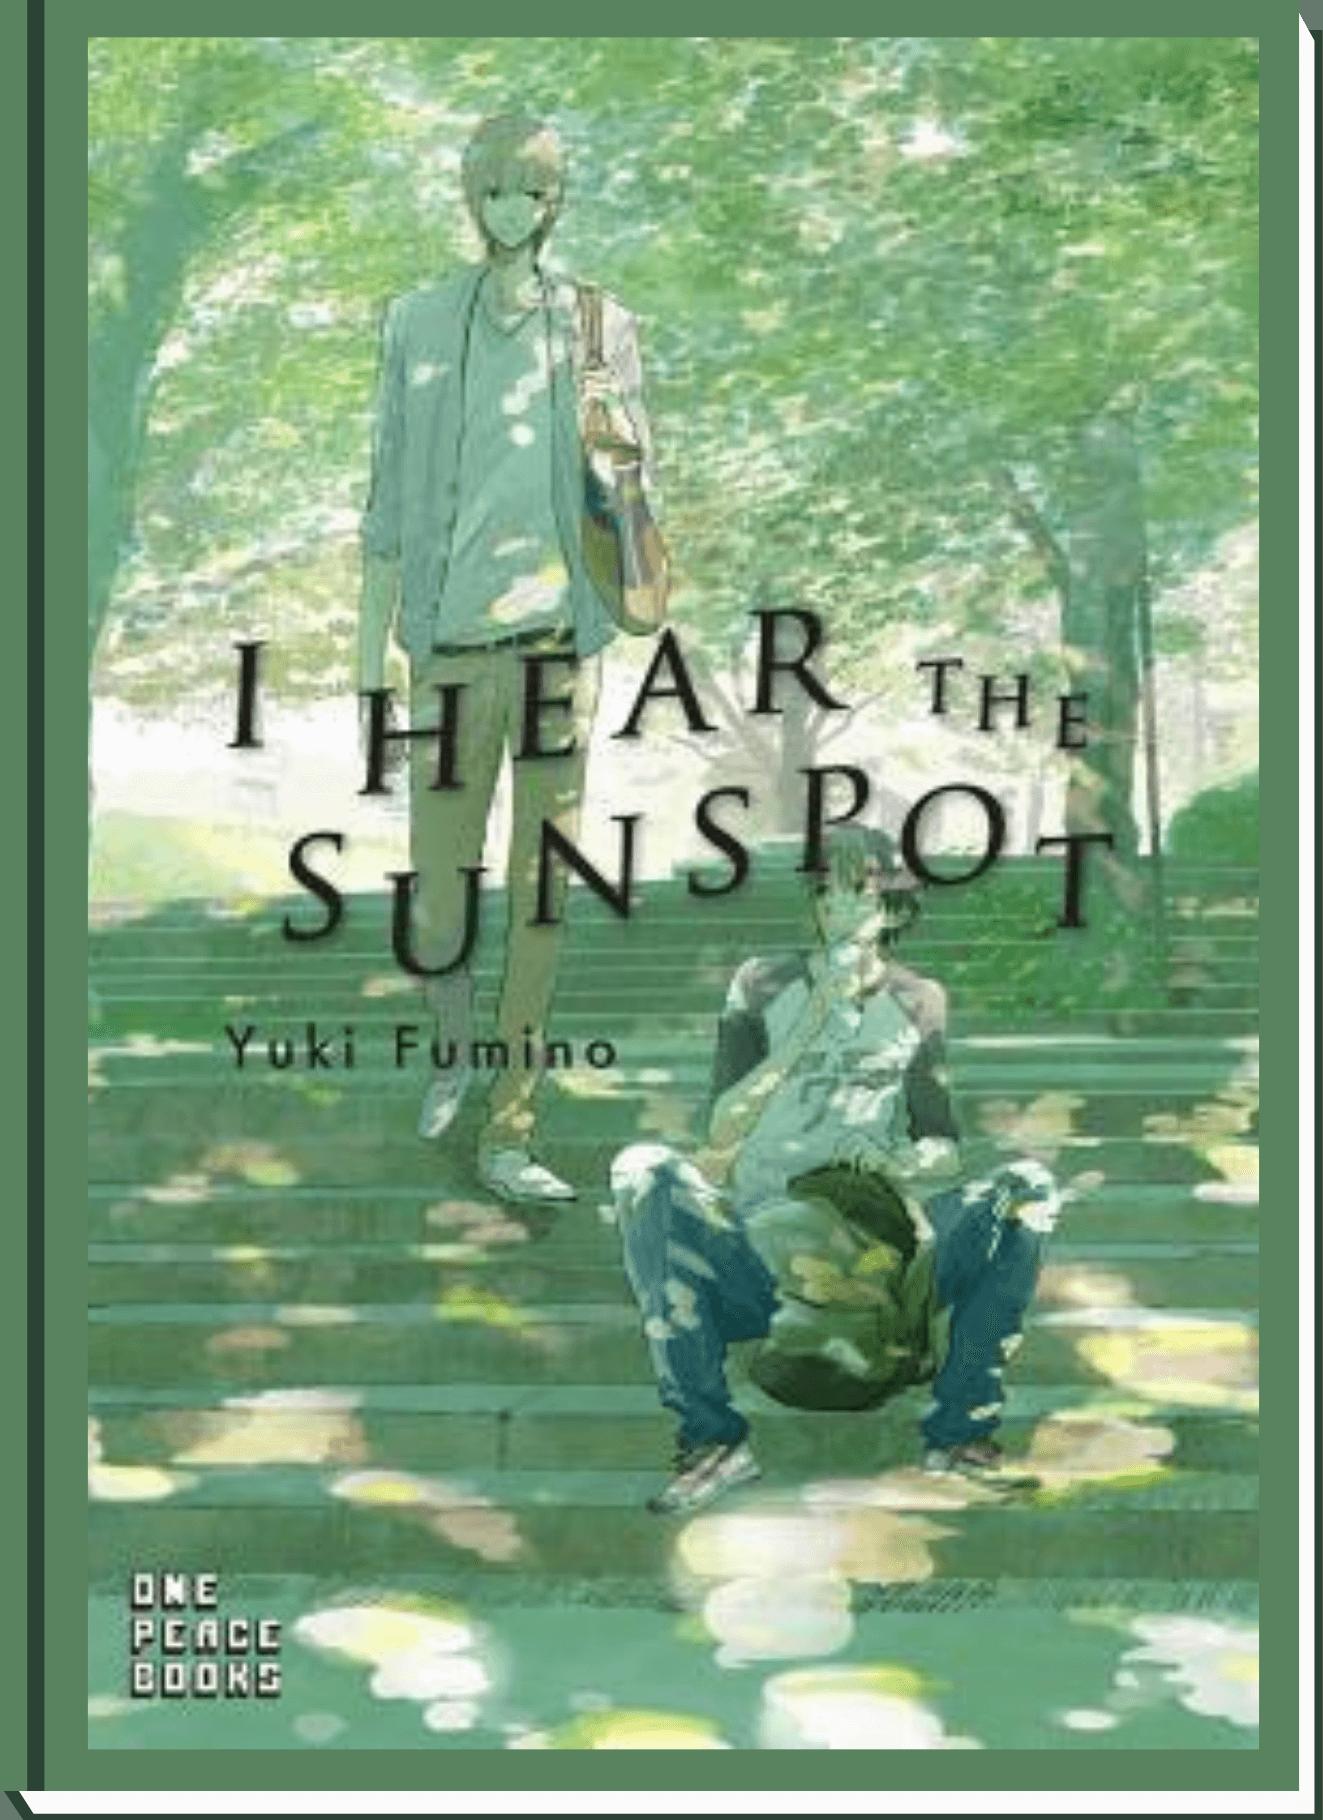 I Hear the Sunspot (ひだまりが聴こえる #1) by Yuki Fumino